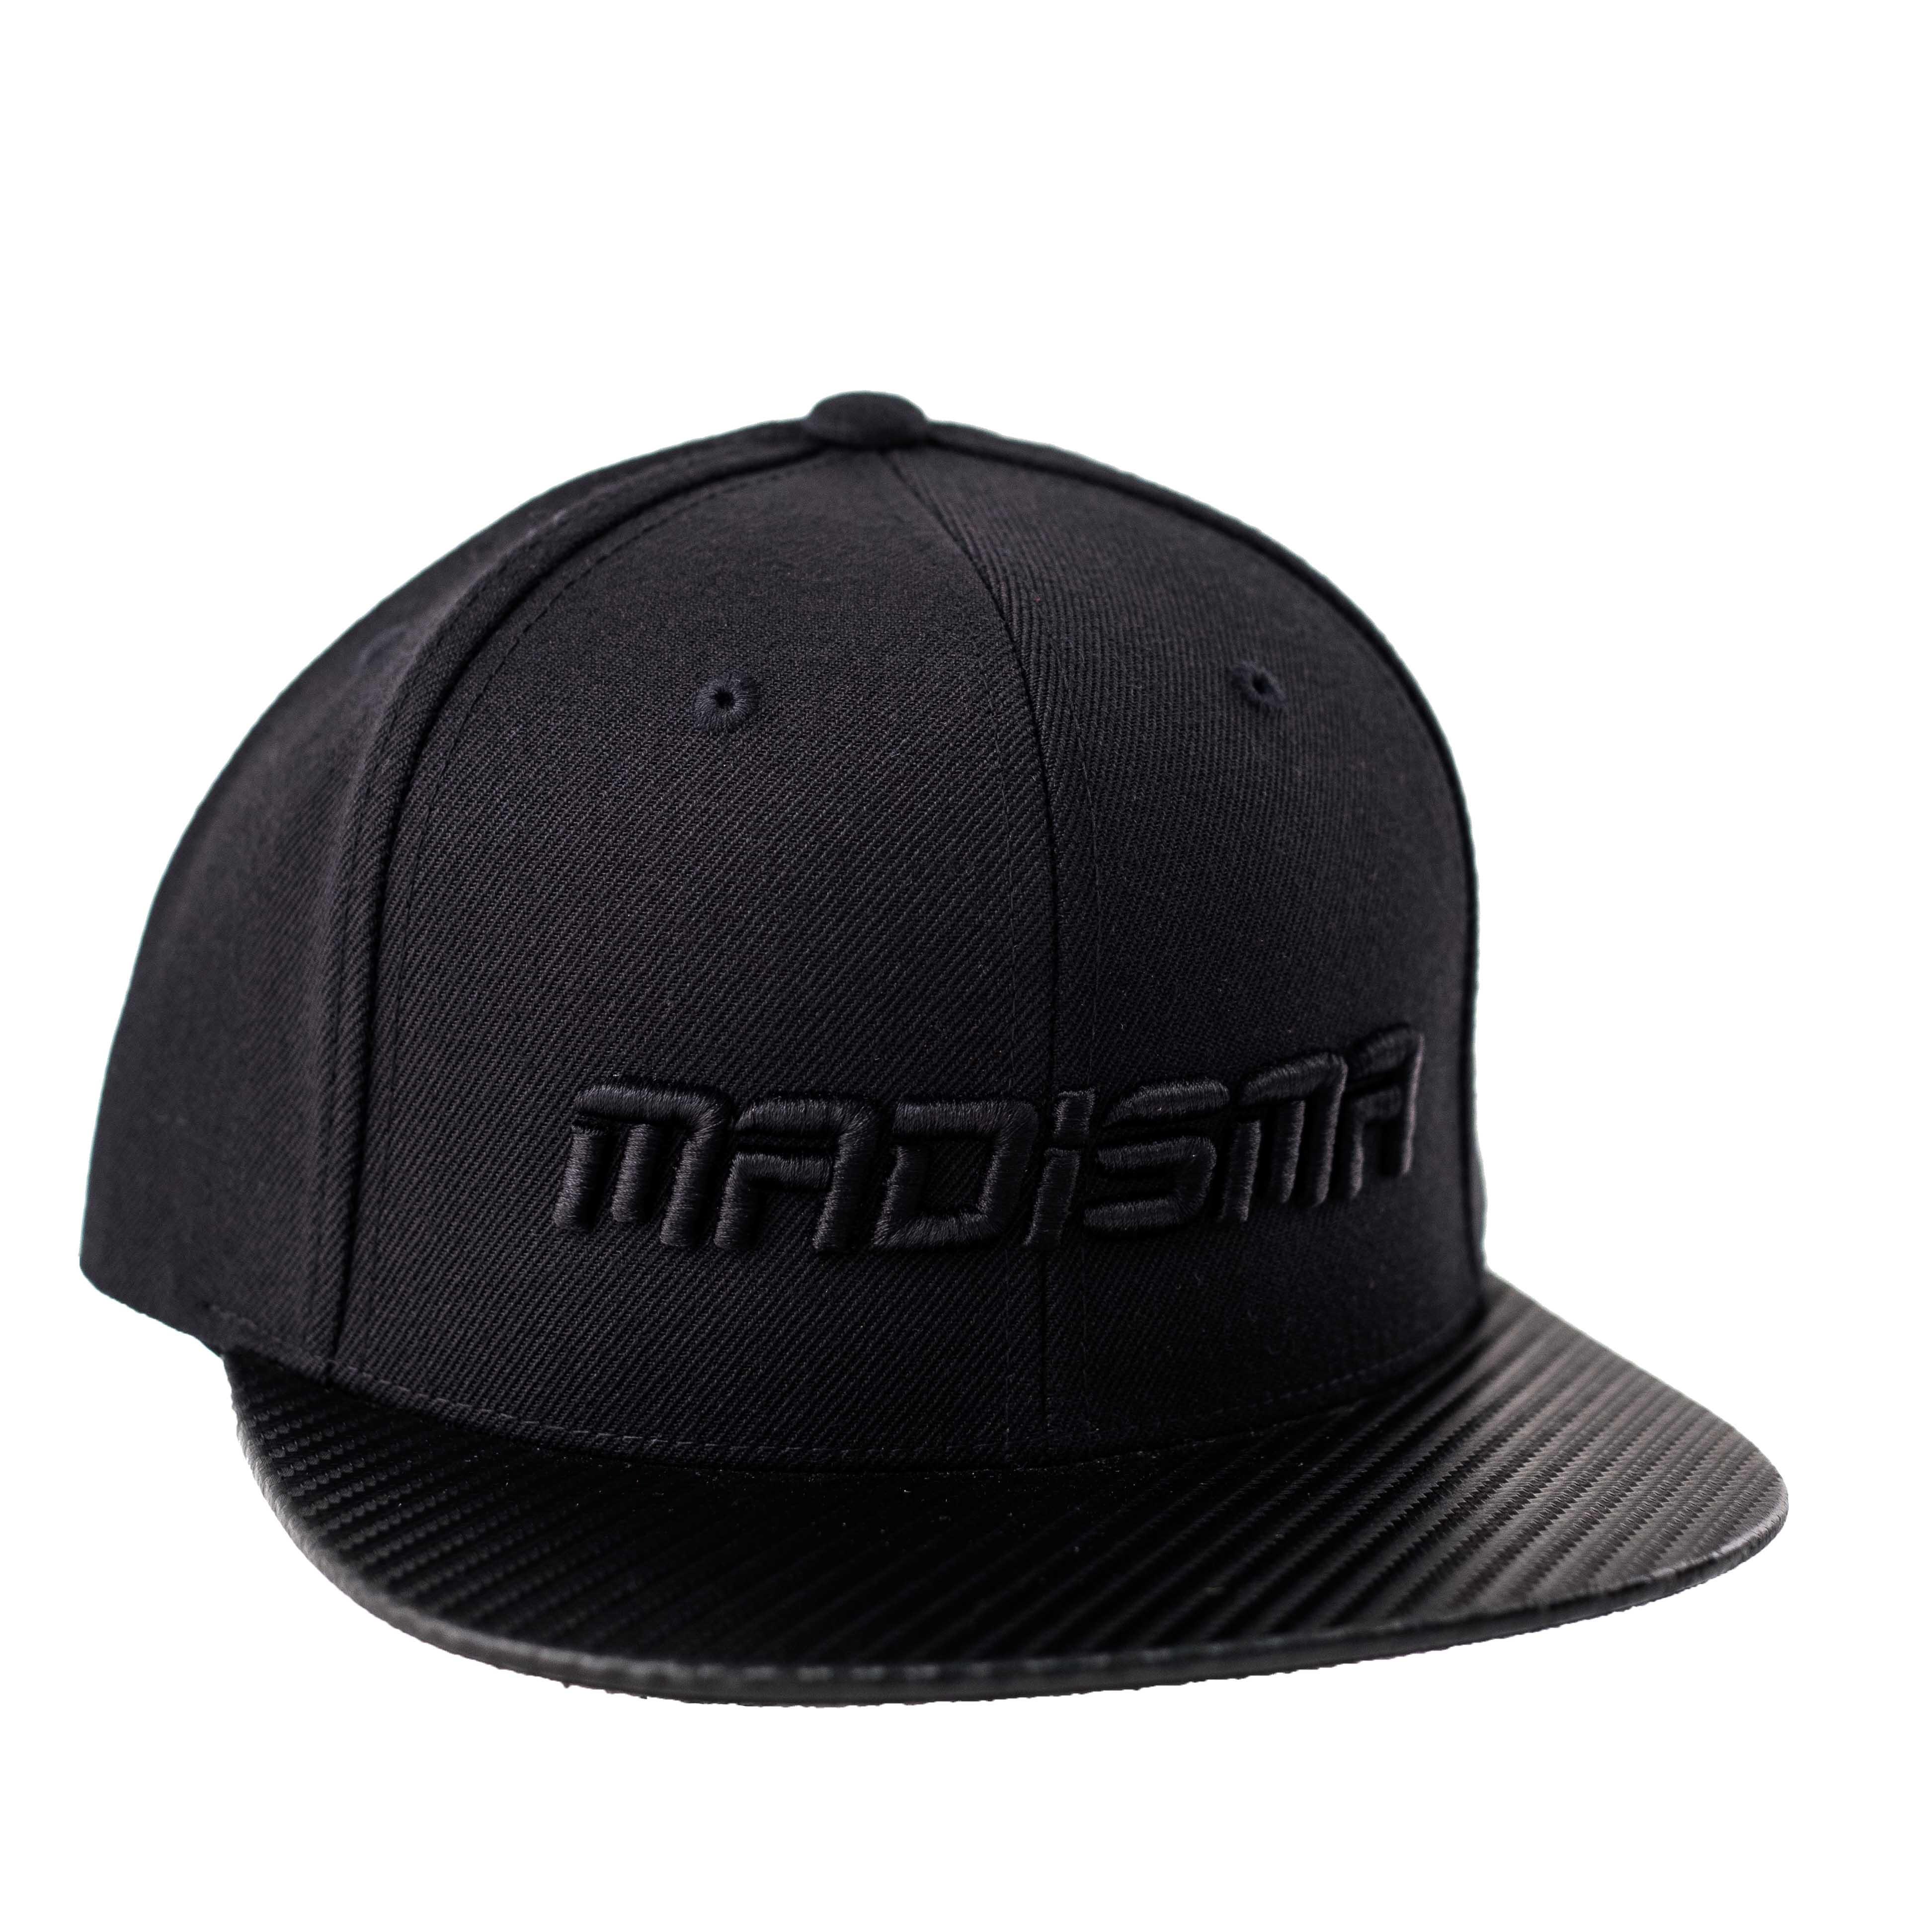 Madisma Carbon Edition